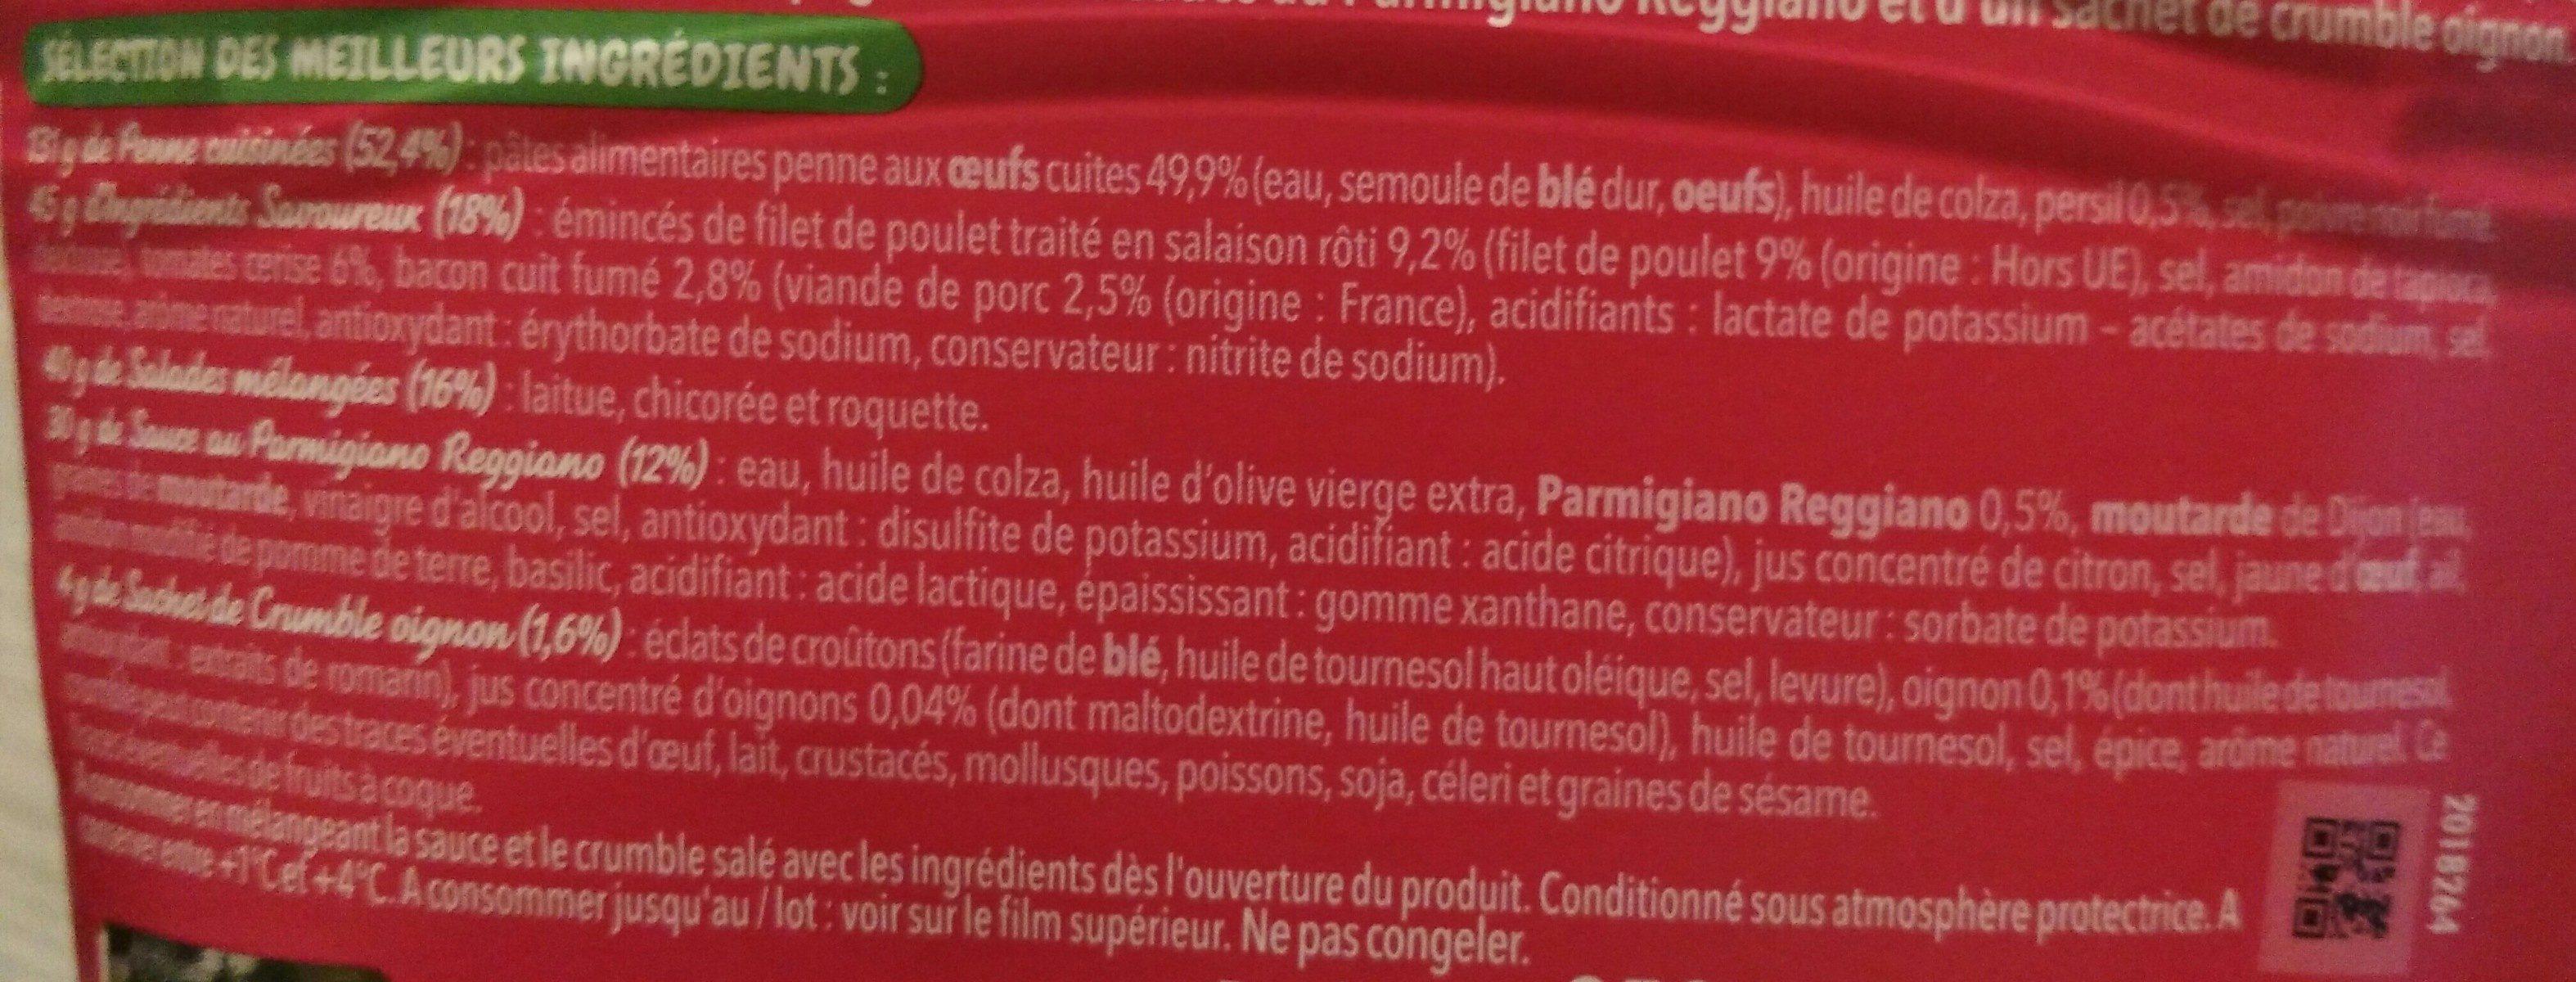 Salade Bol Poulet Bacon - Ingrédients - fr